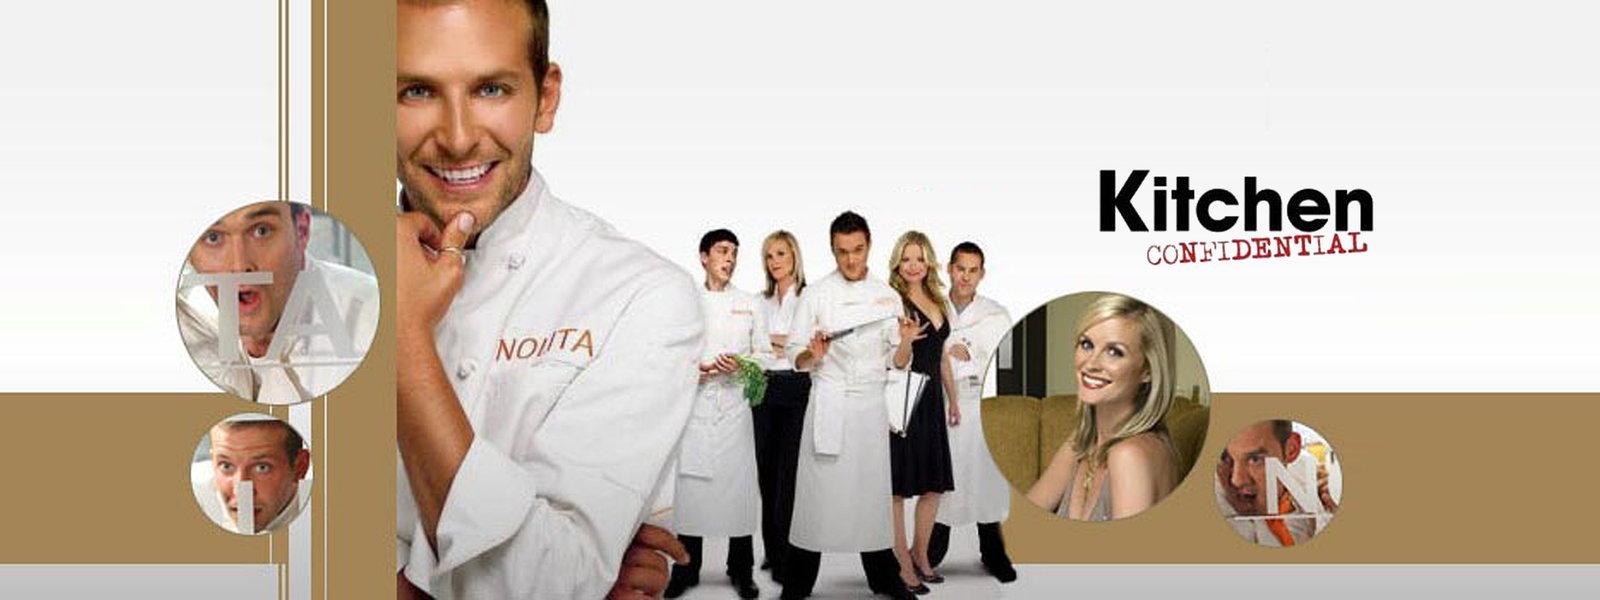 Watch Kitchen Confidential Online at Hulu